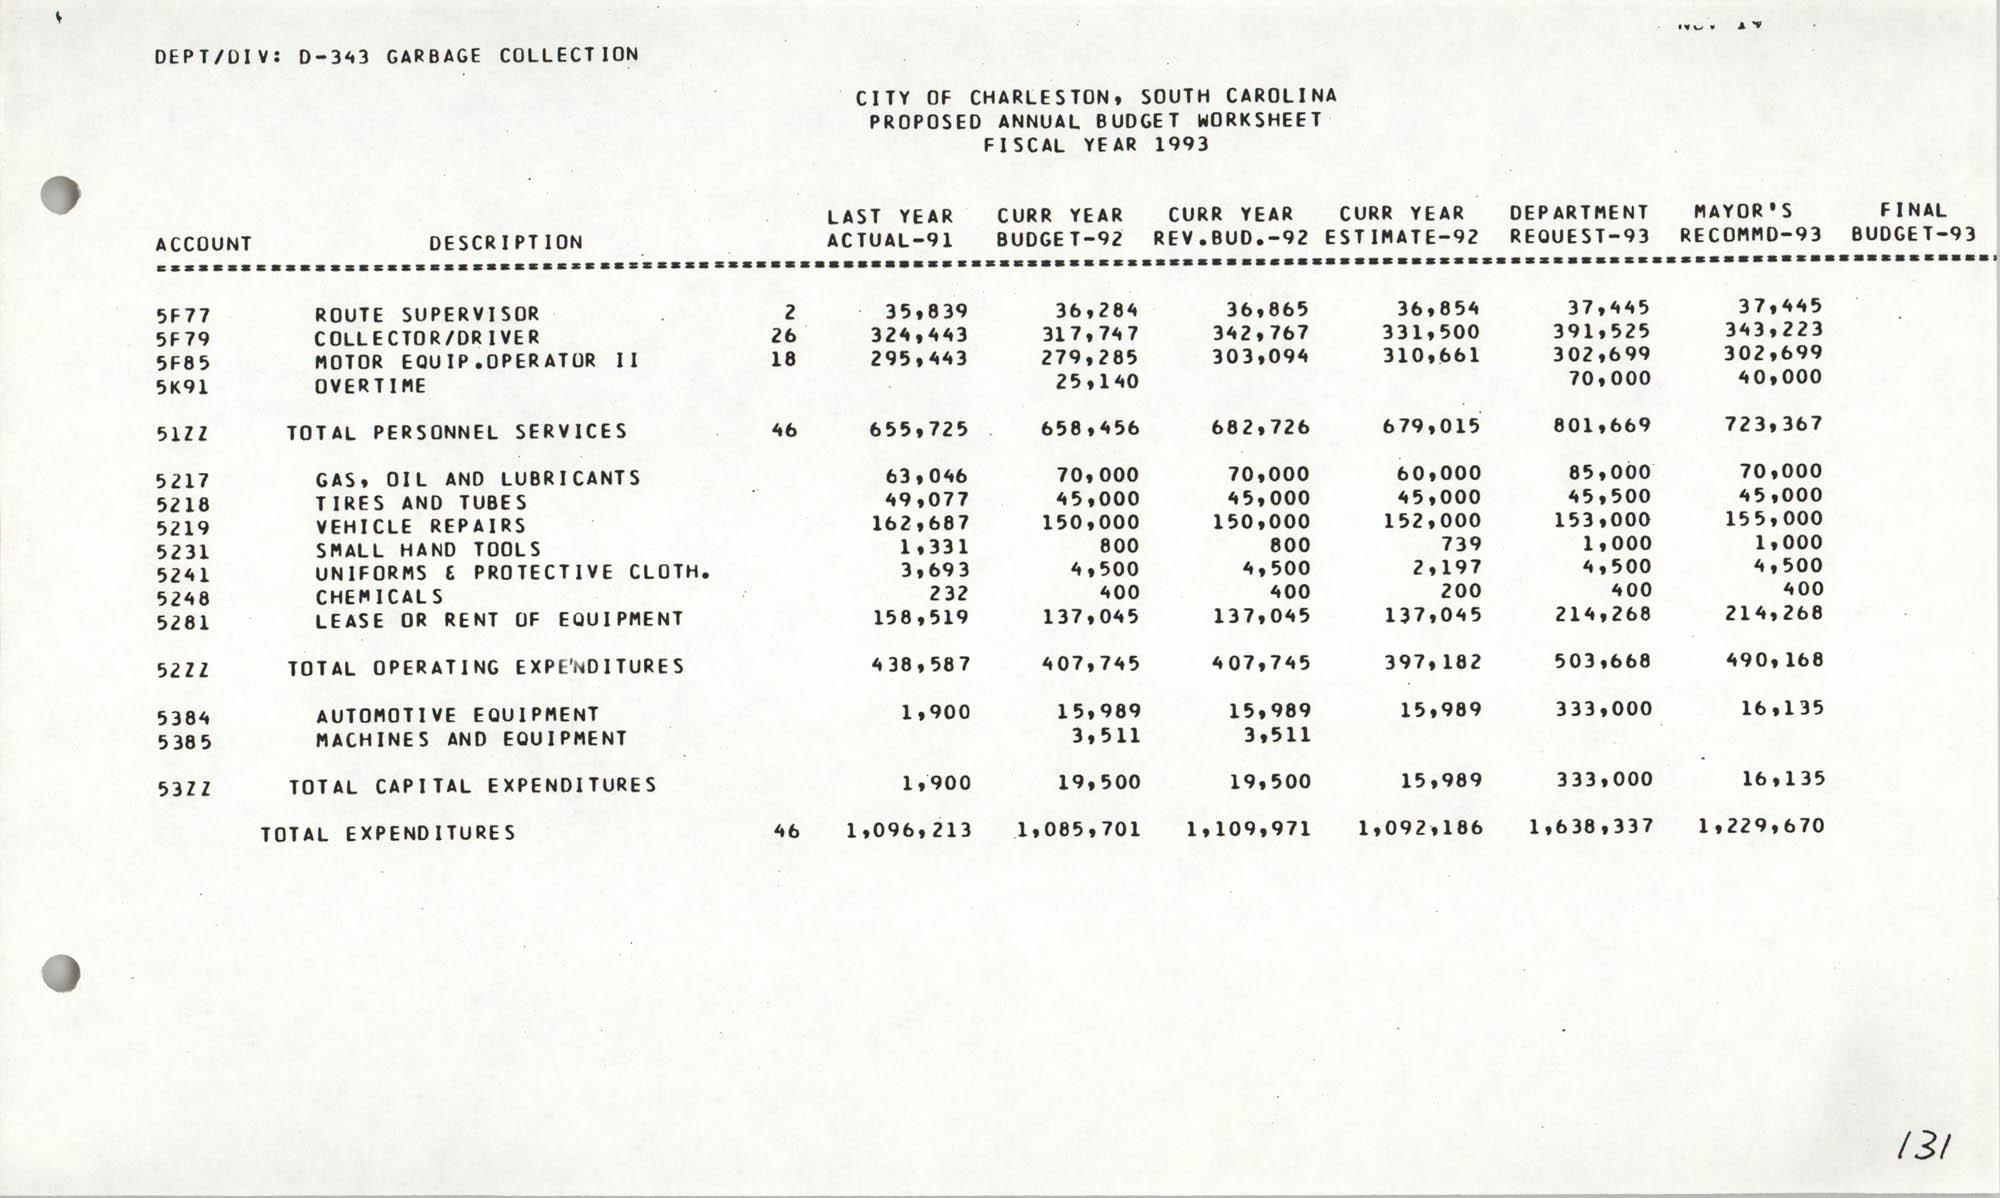 The City Council of Charleston, South Carolina, 1993 Budget, Page 131